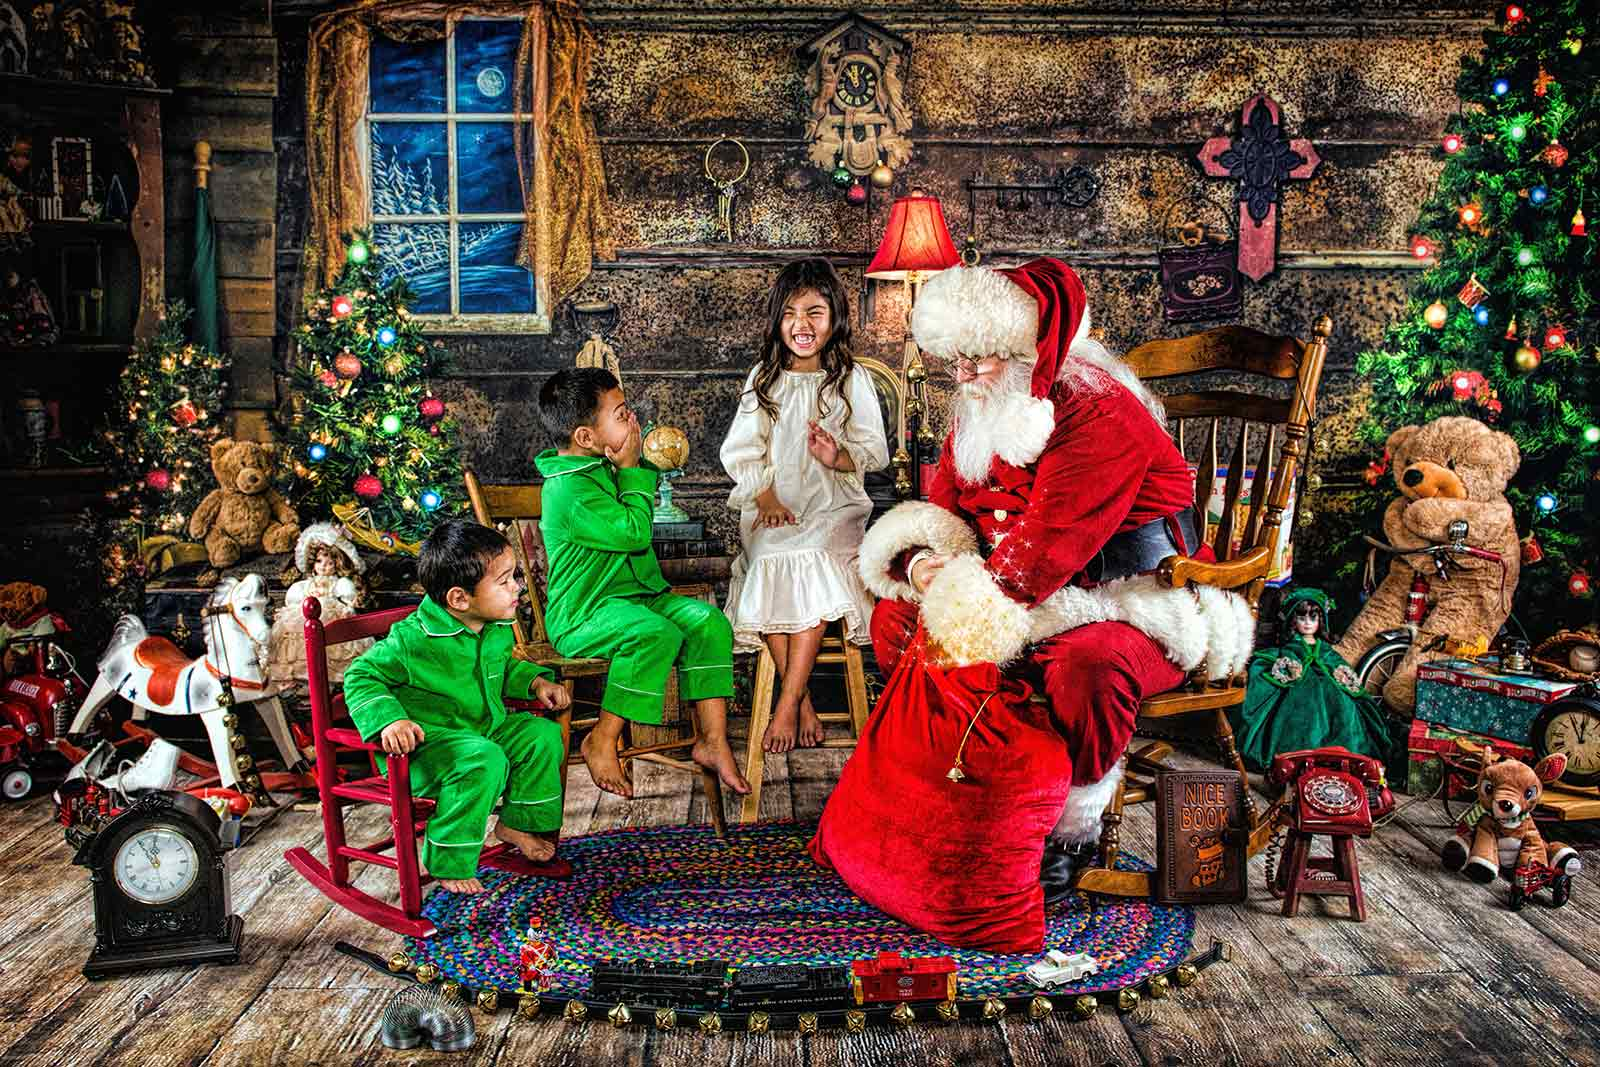 016_Magic-of-Santa-Anna-Thielen-Photography